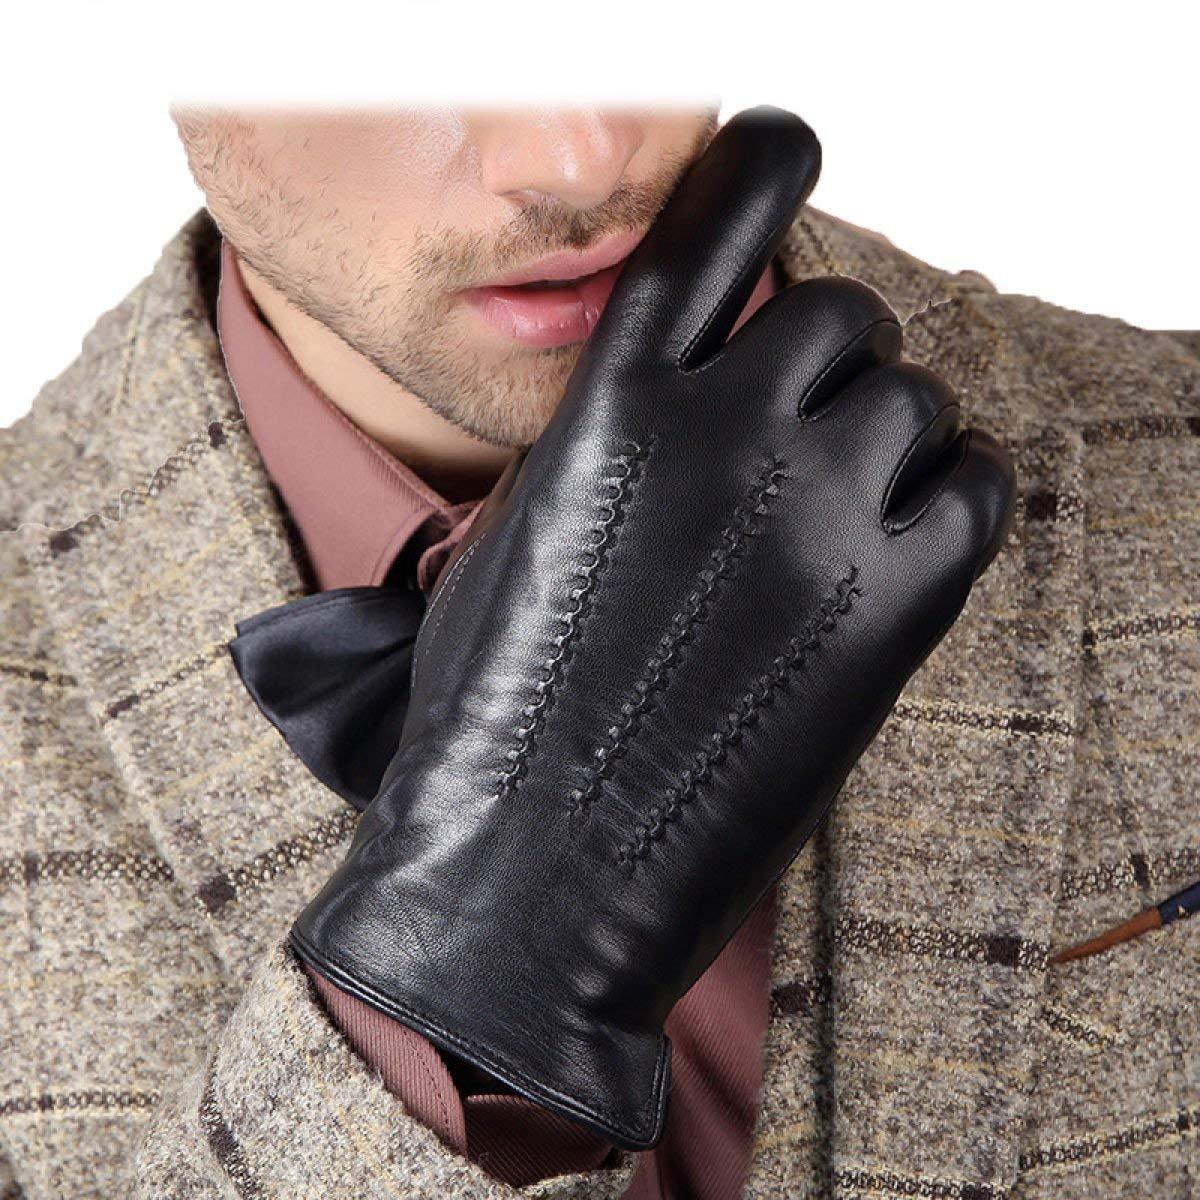 CWJ Warm Full Palm Touch Screen String Flower Craft Men's Gloves,Black,Large